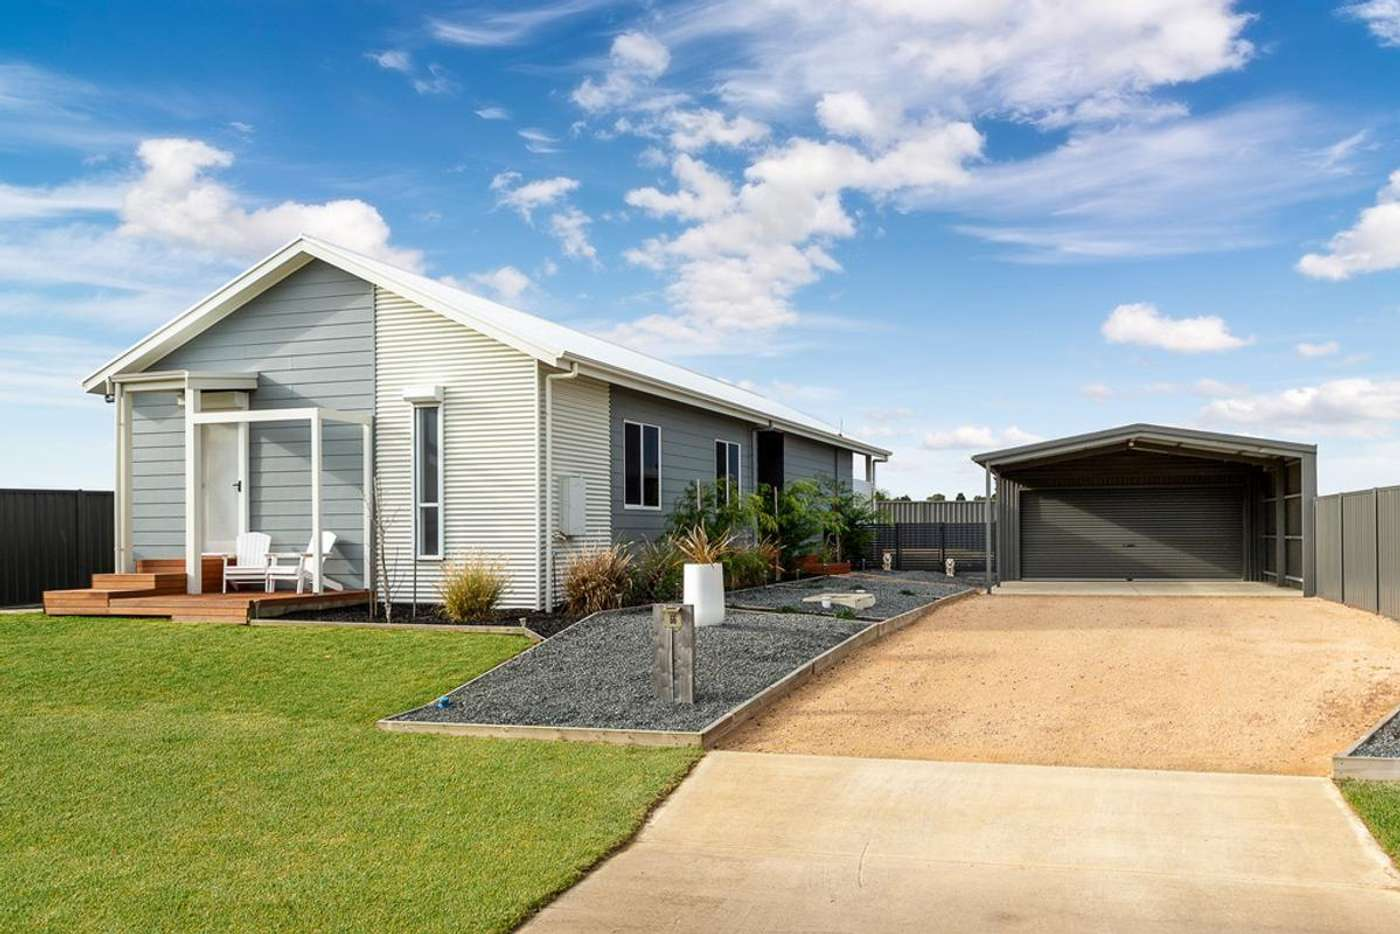 Main view of Homely house listing, 66 George Mason Street, Wellington East SA 5259